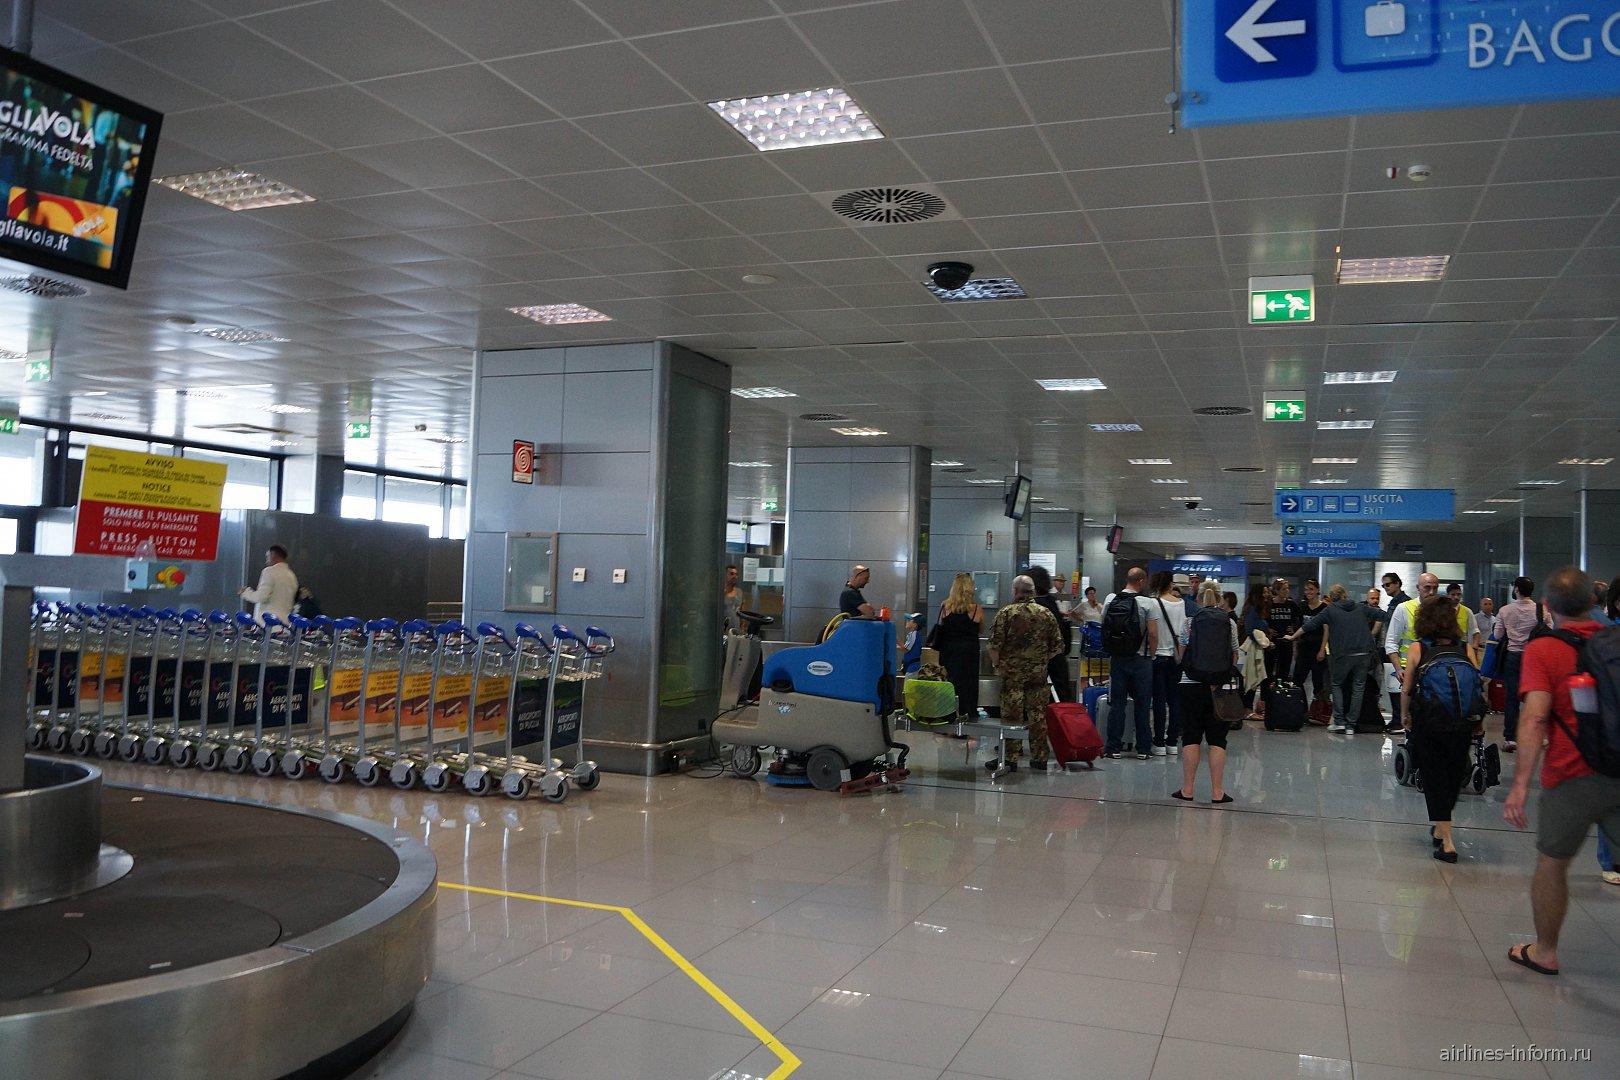 Зал выдачи багажа в аэропорту Бриндизи Саленто